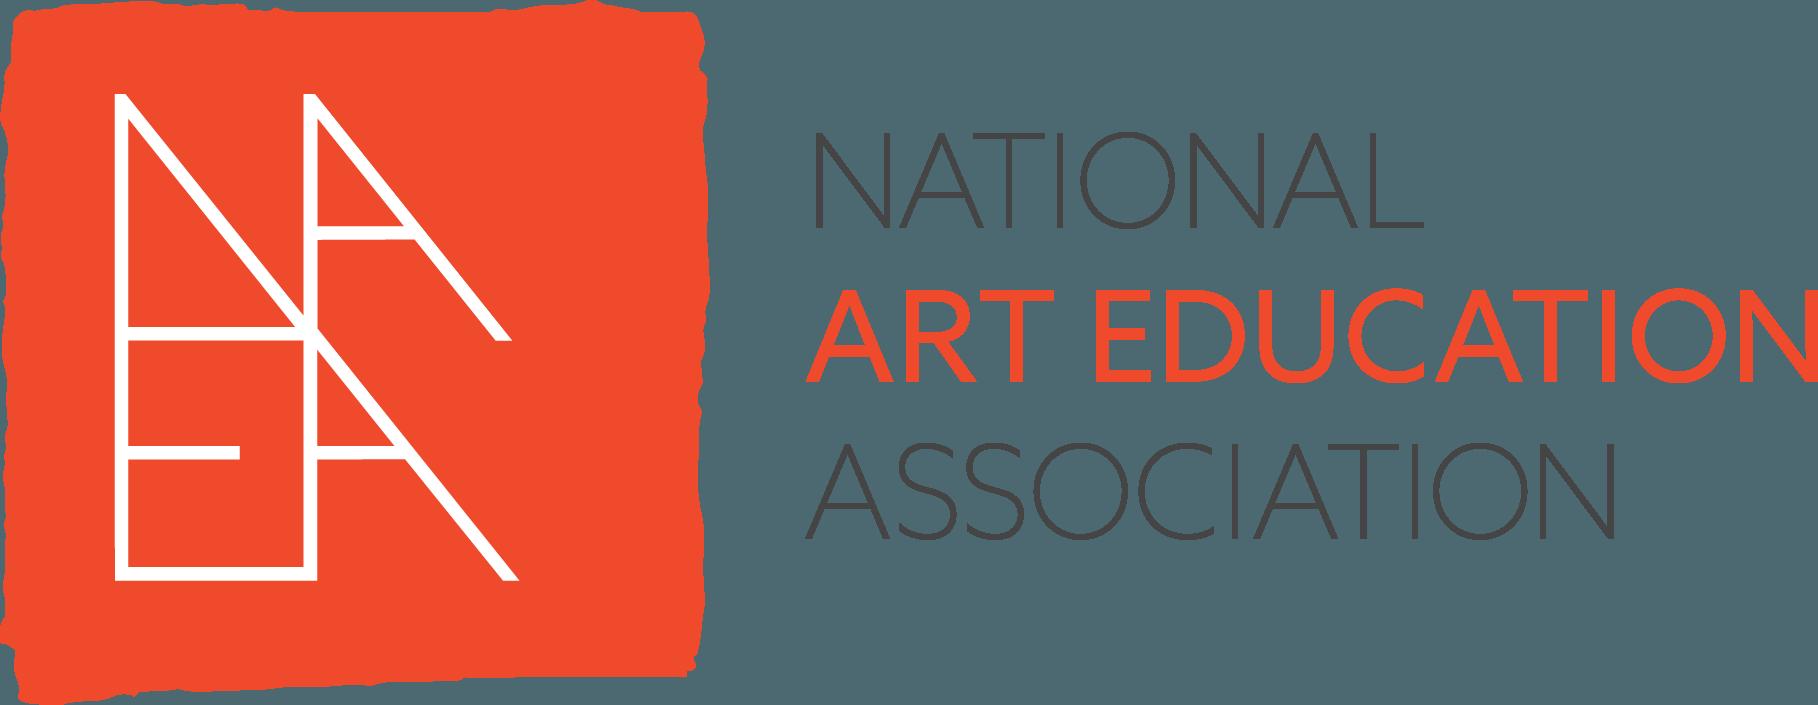 NAEA Logo [National Art Education Association] png